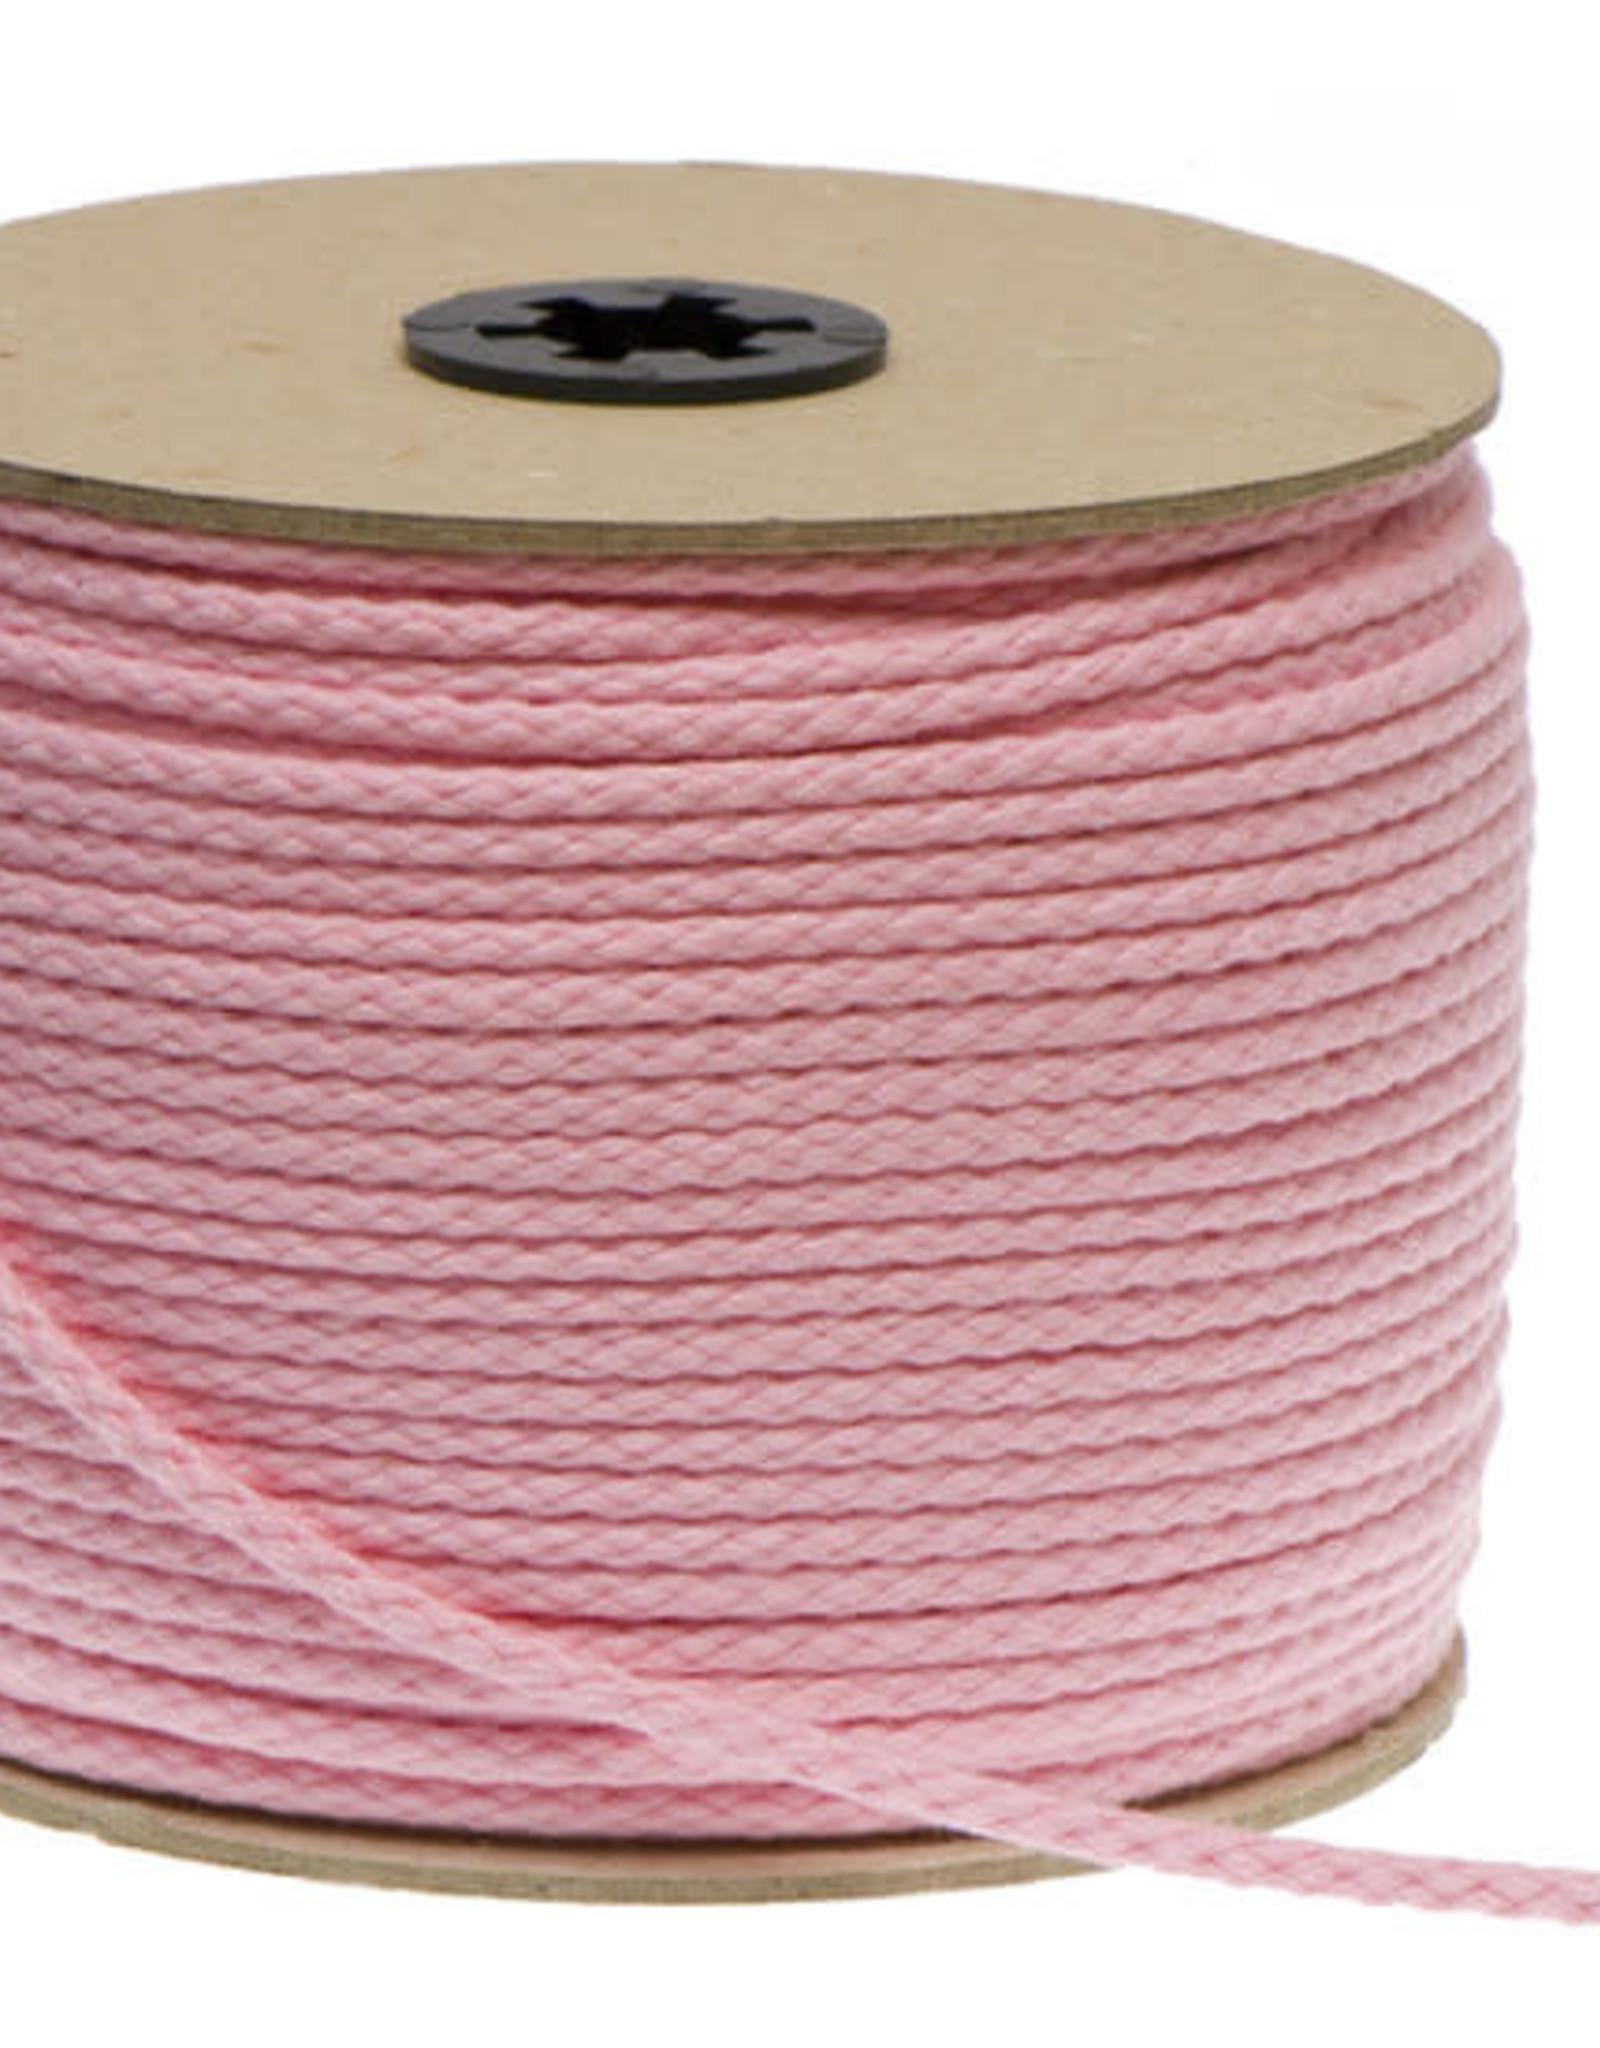 Katoenen Koord Roze  - 5mm